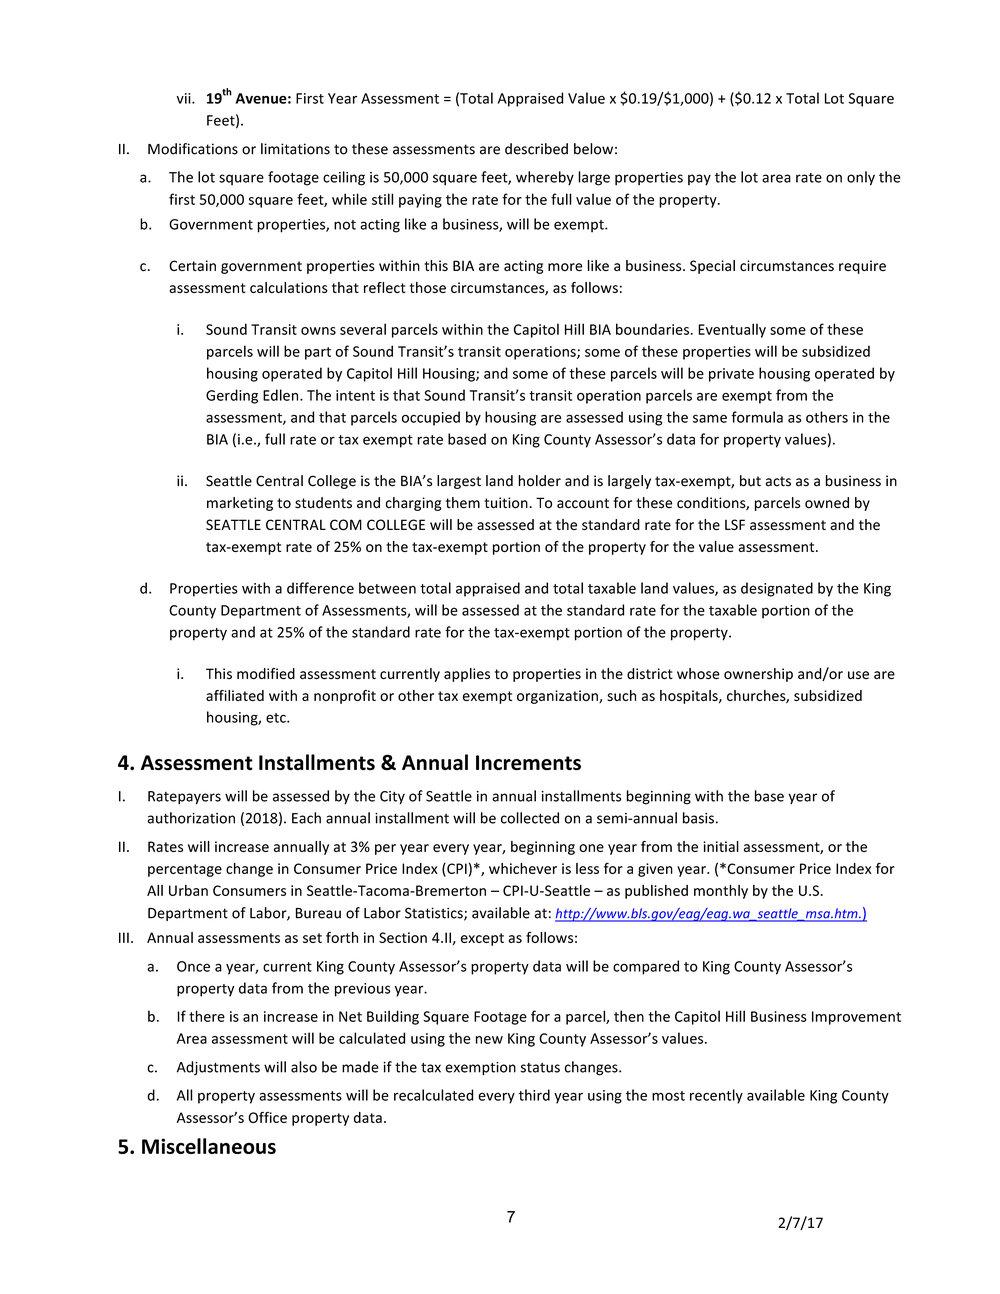 CHBIA-PetitionBody-20170207-v11_Page_7.jpg